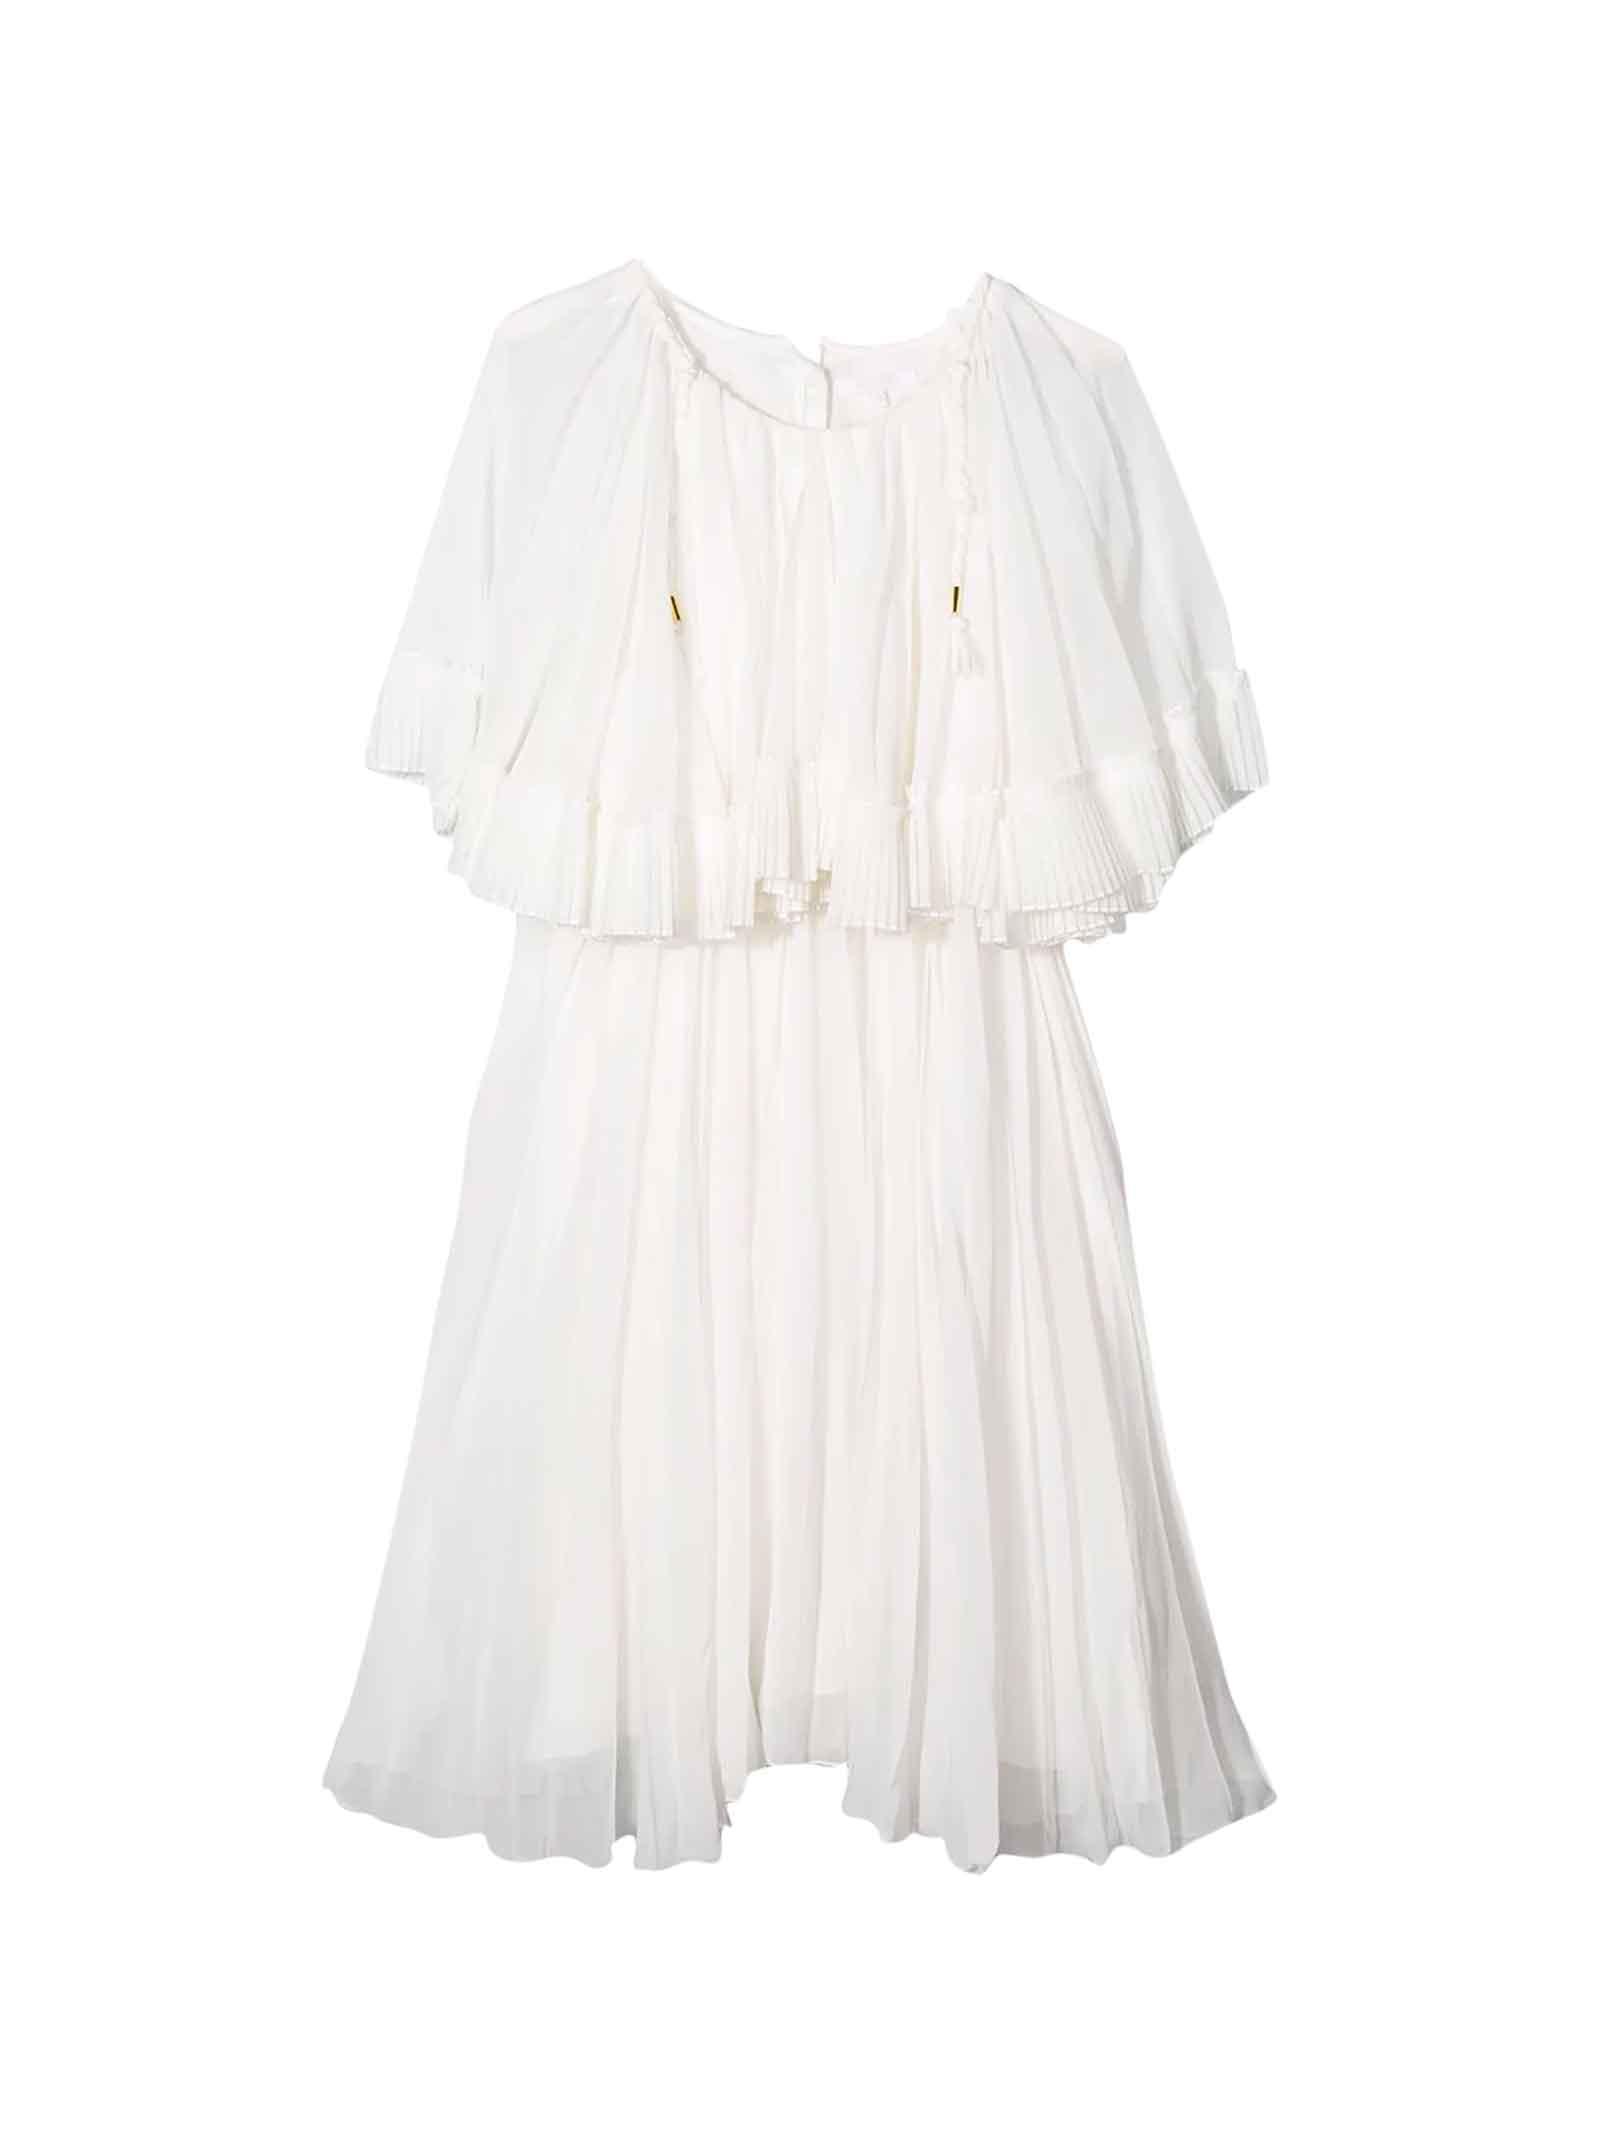 Buy Chloé White Dress Chloé Kids online, shop Chloé with free shipping